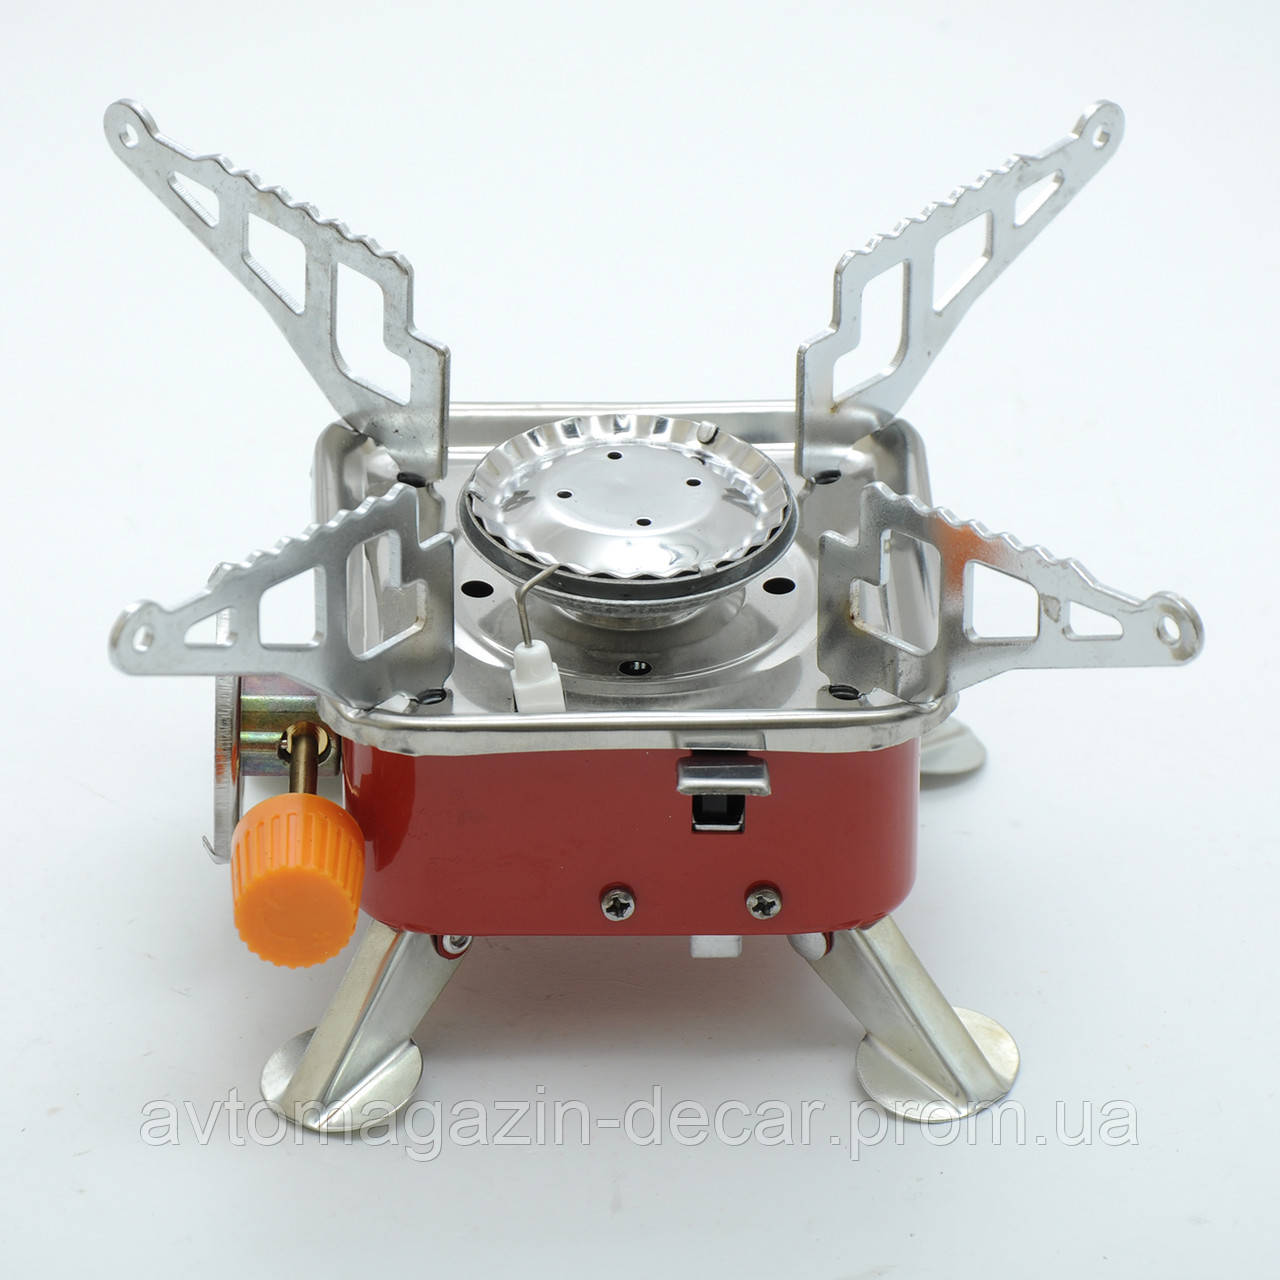 Газовая плита №201 MINI (под балон) регулировка подачи газа+сумка